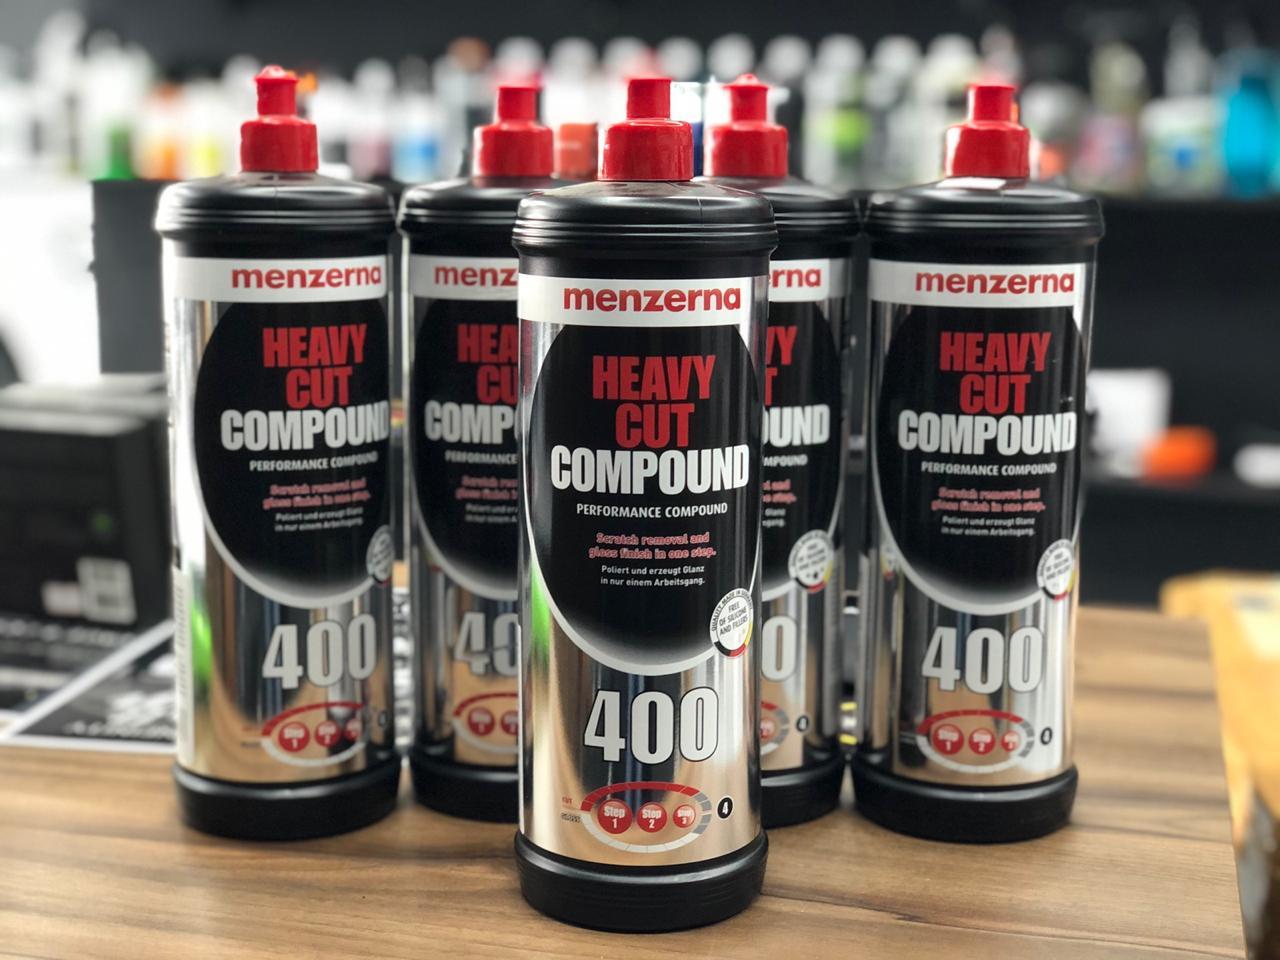 HEAVY CUT COMPOUND Polidor 400 1l - Menzerna